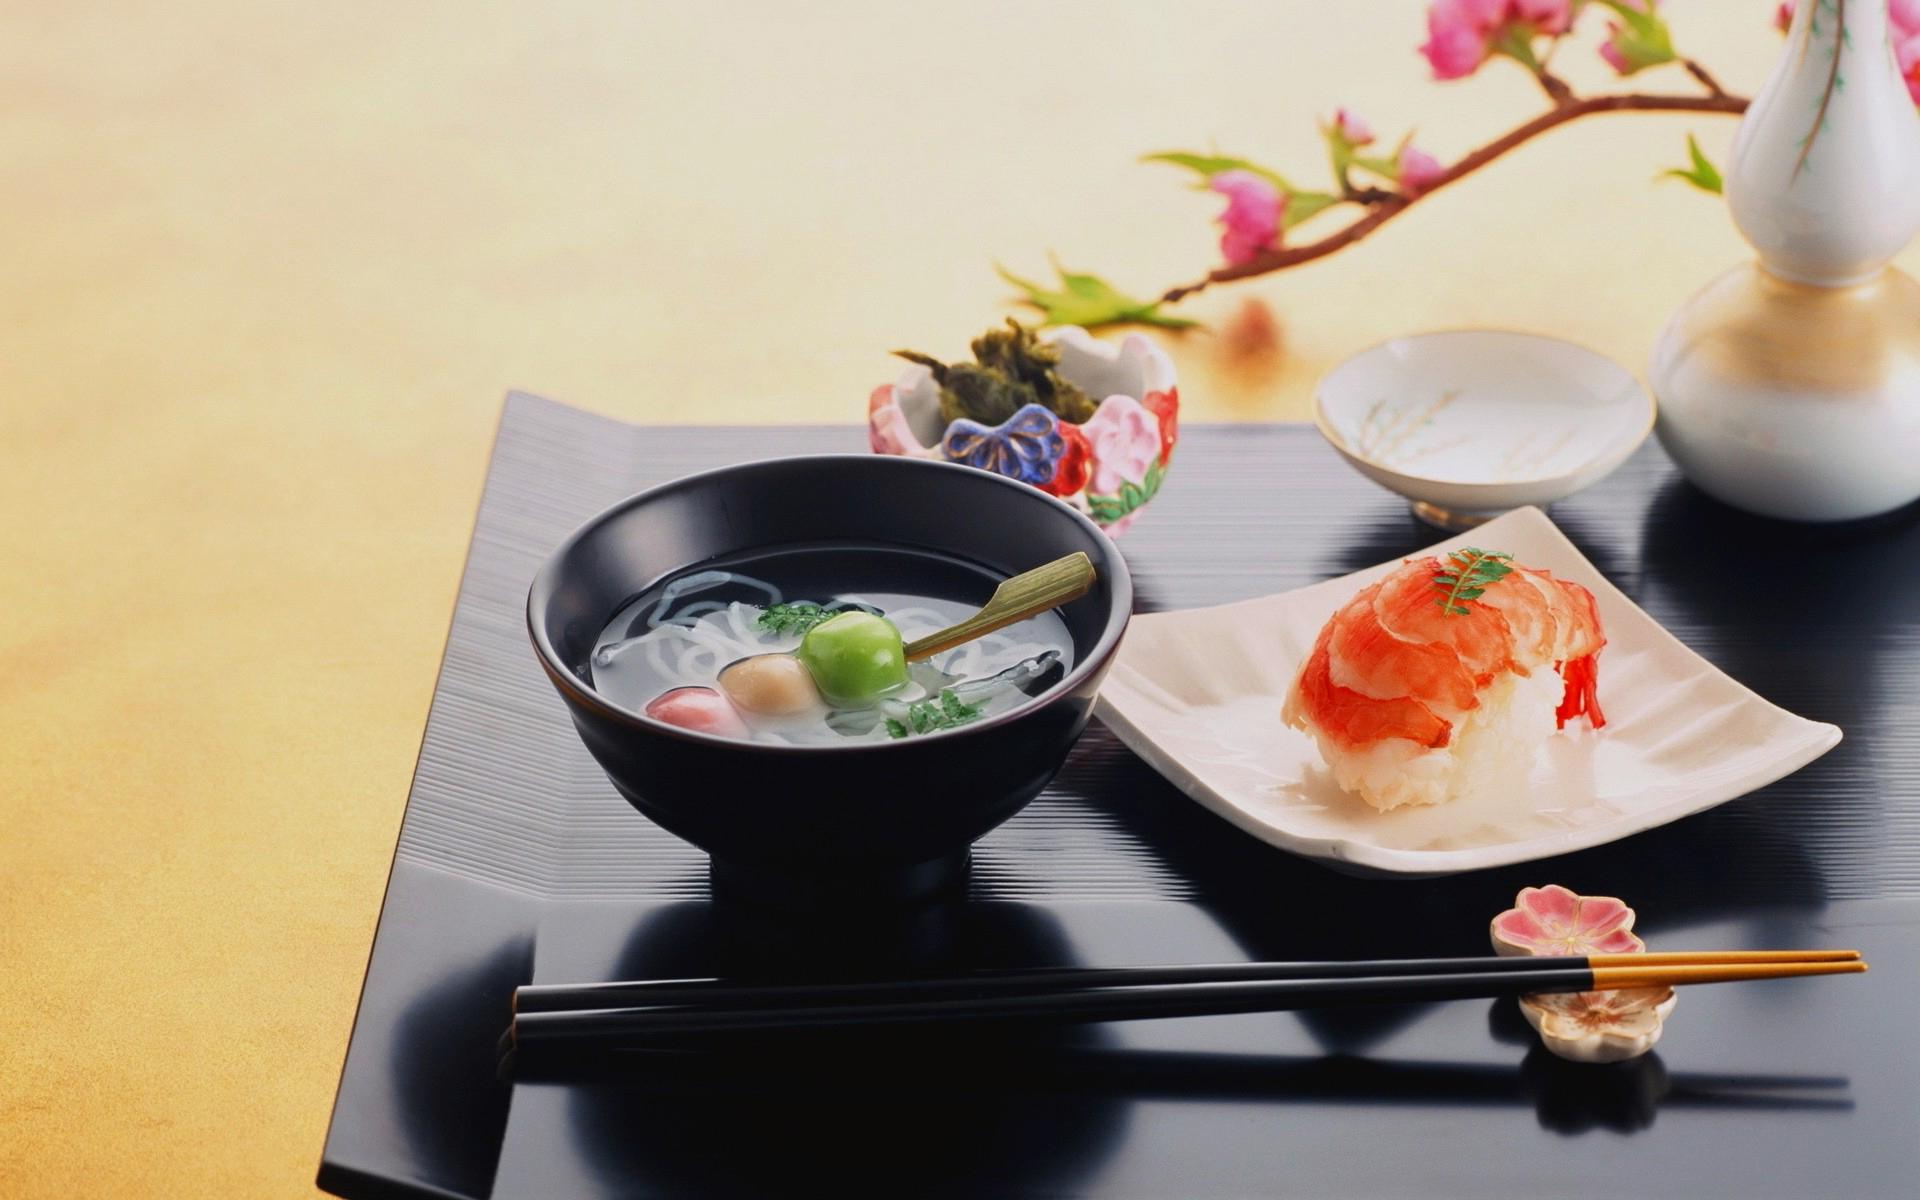 Sushi Computer Wallpapers, Desktop Backgrounds | 1920x1200 ...